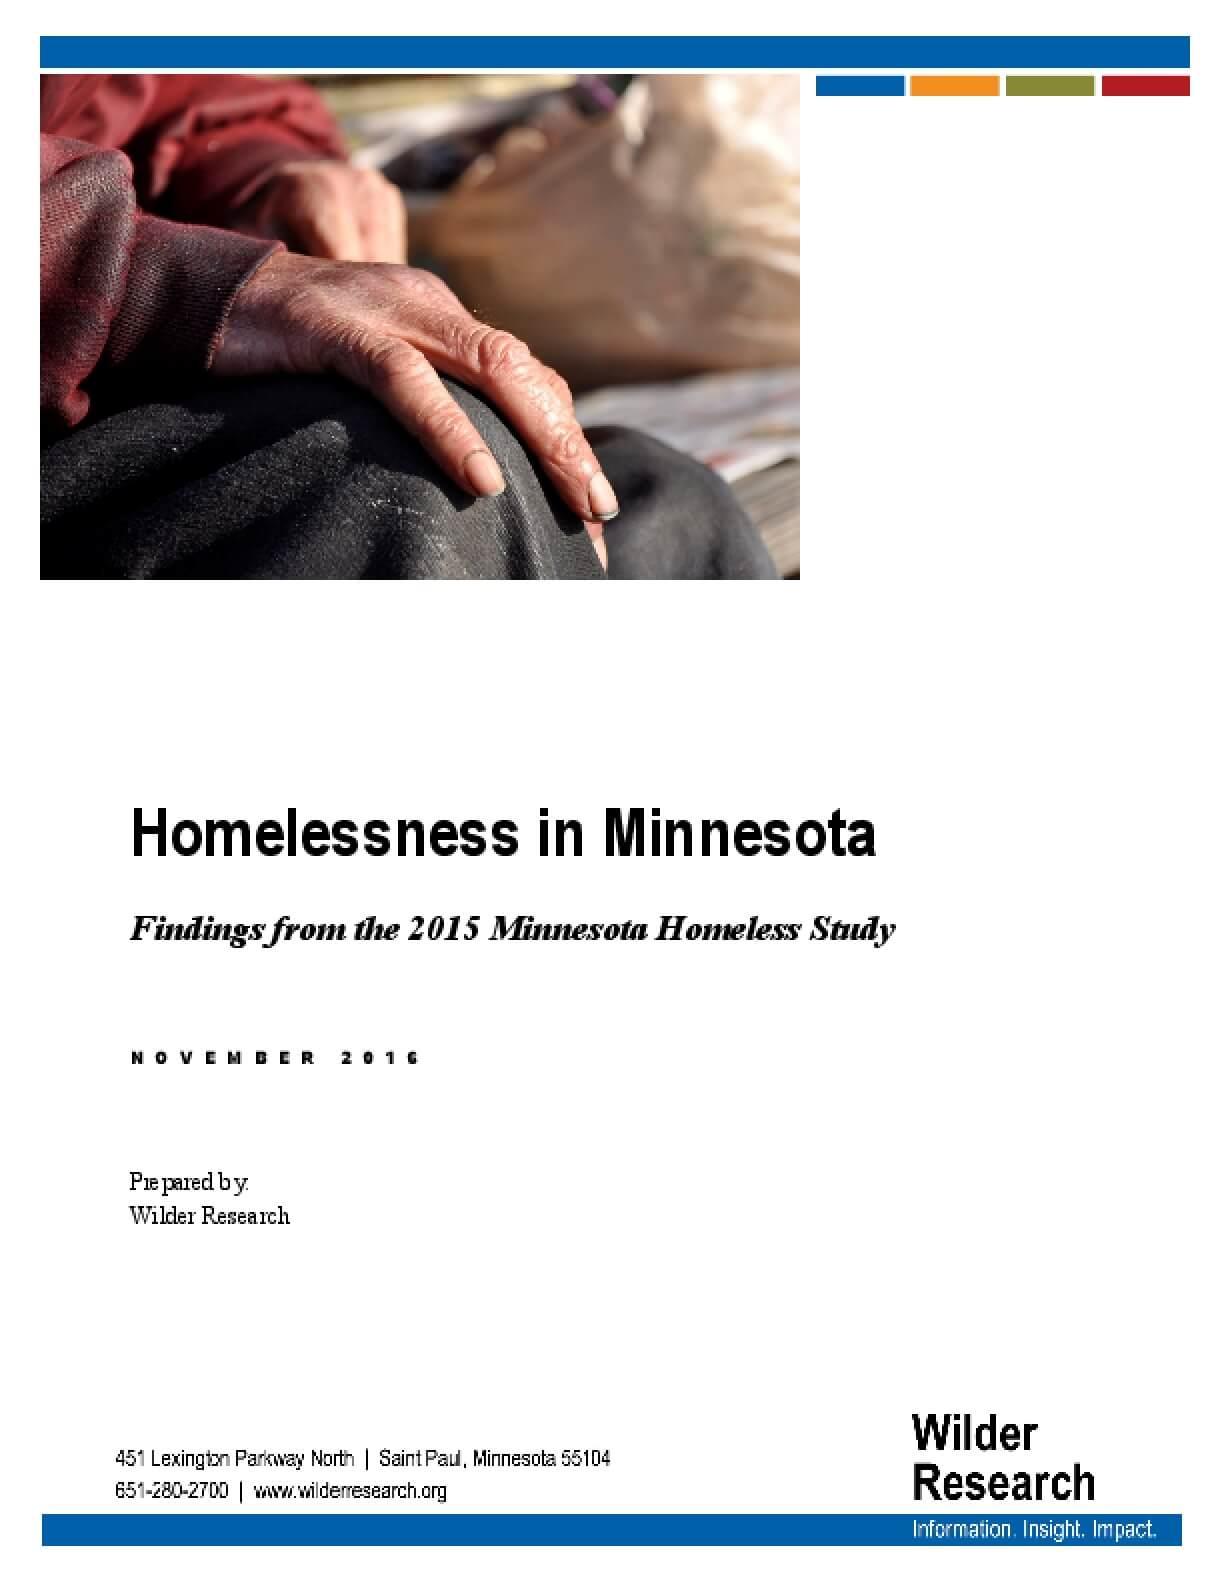 Homelessness in Minnesota: Findings from the 2015 Minnesota Homeless Study